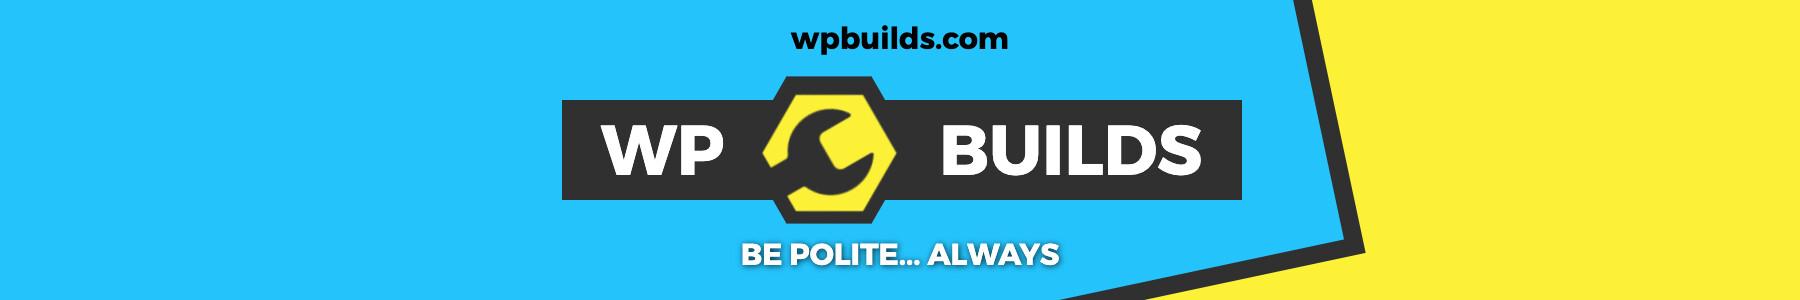 WP Builds Social